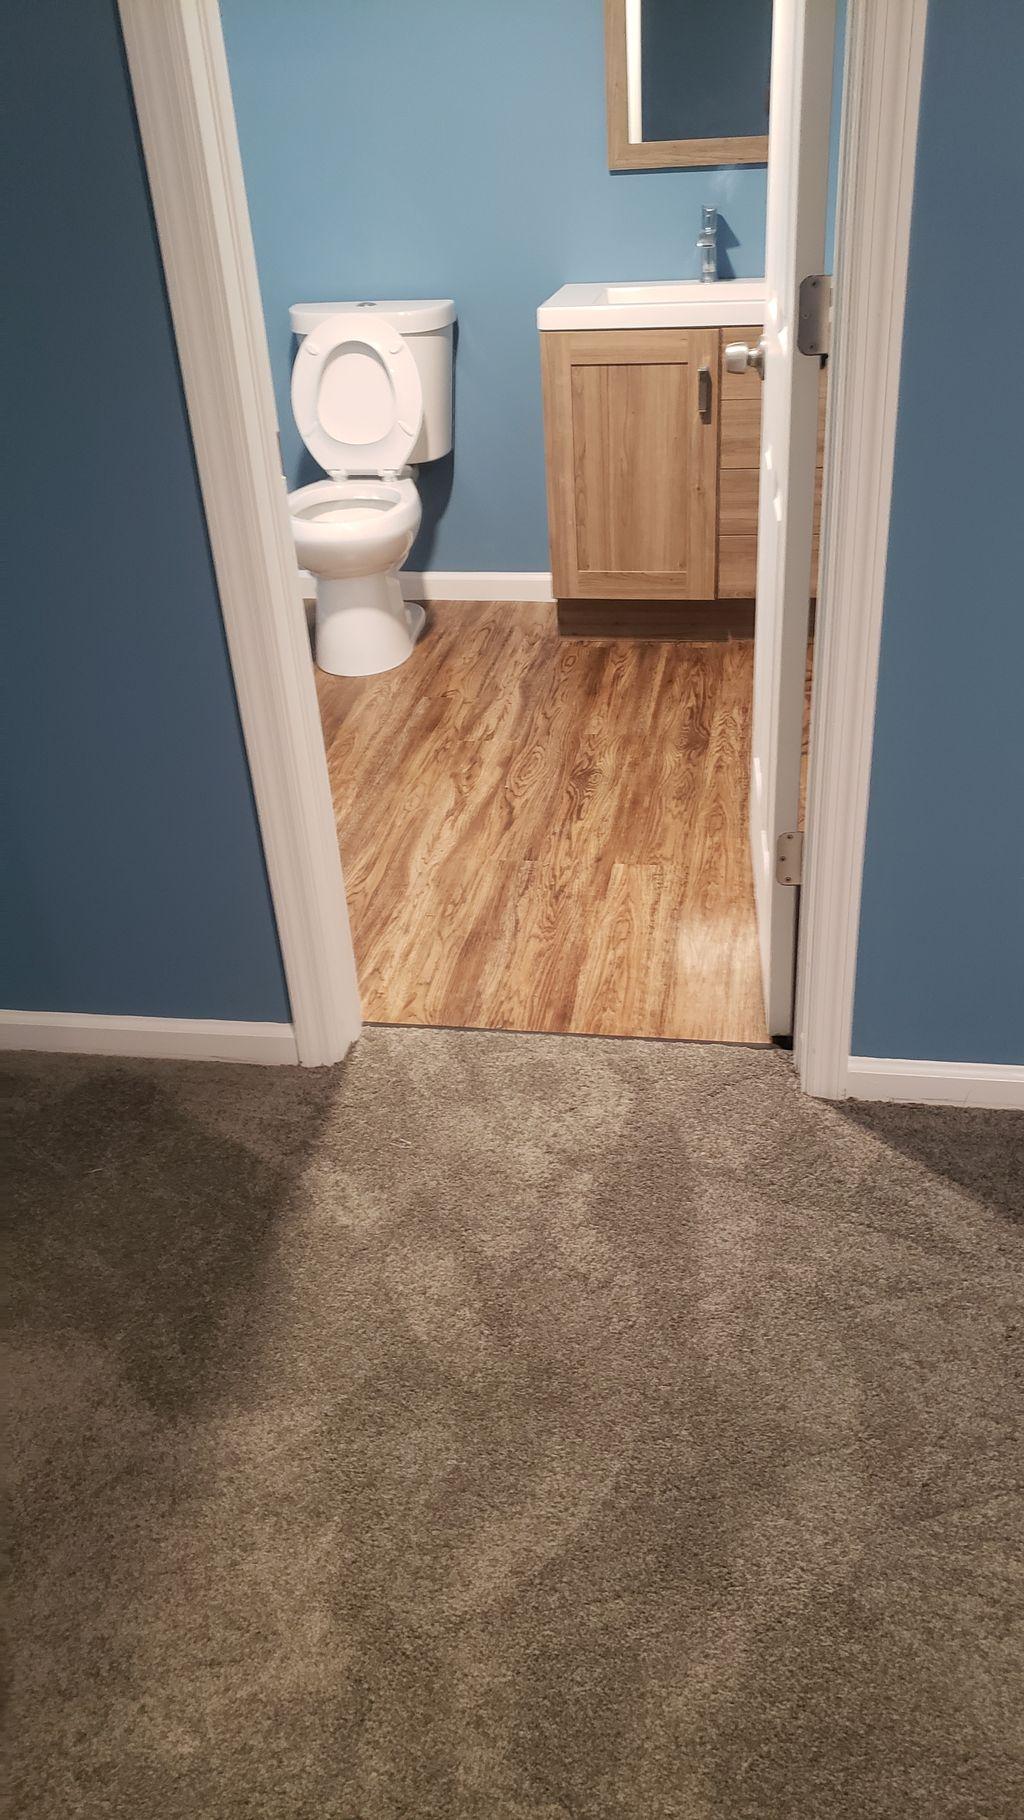 Basement carpet and install bathroom pkank